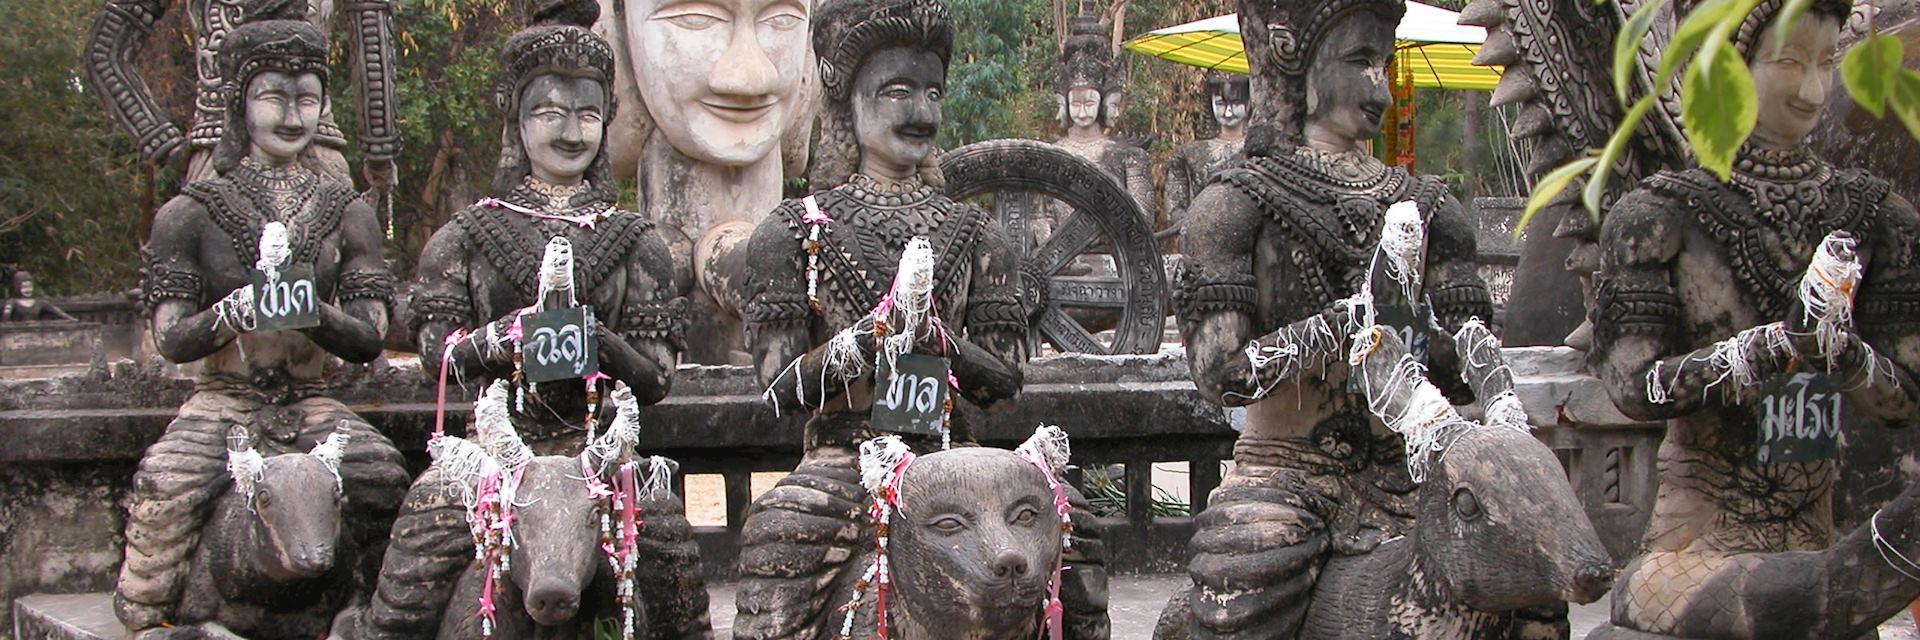 Sala Keow Ku, Nong Khai